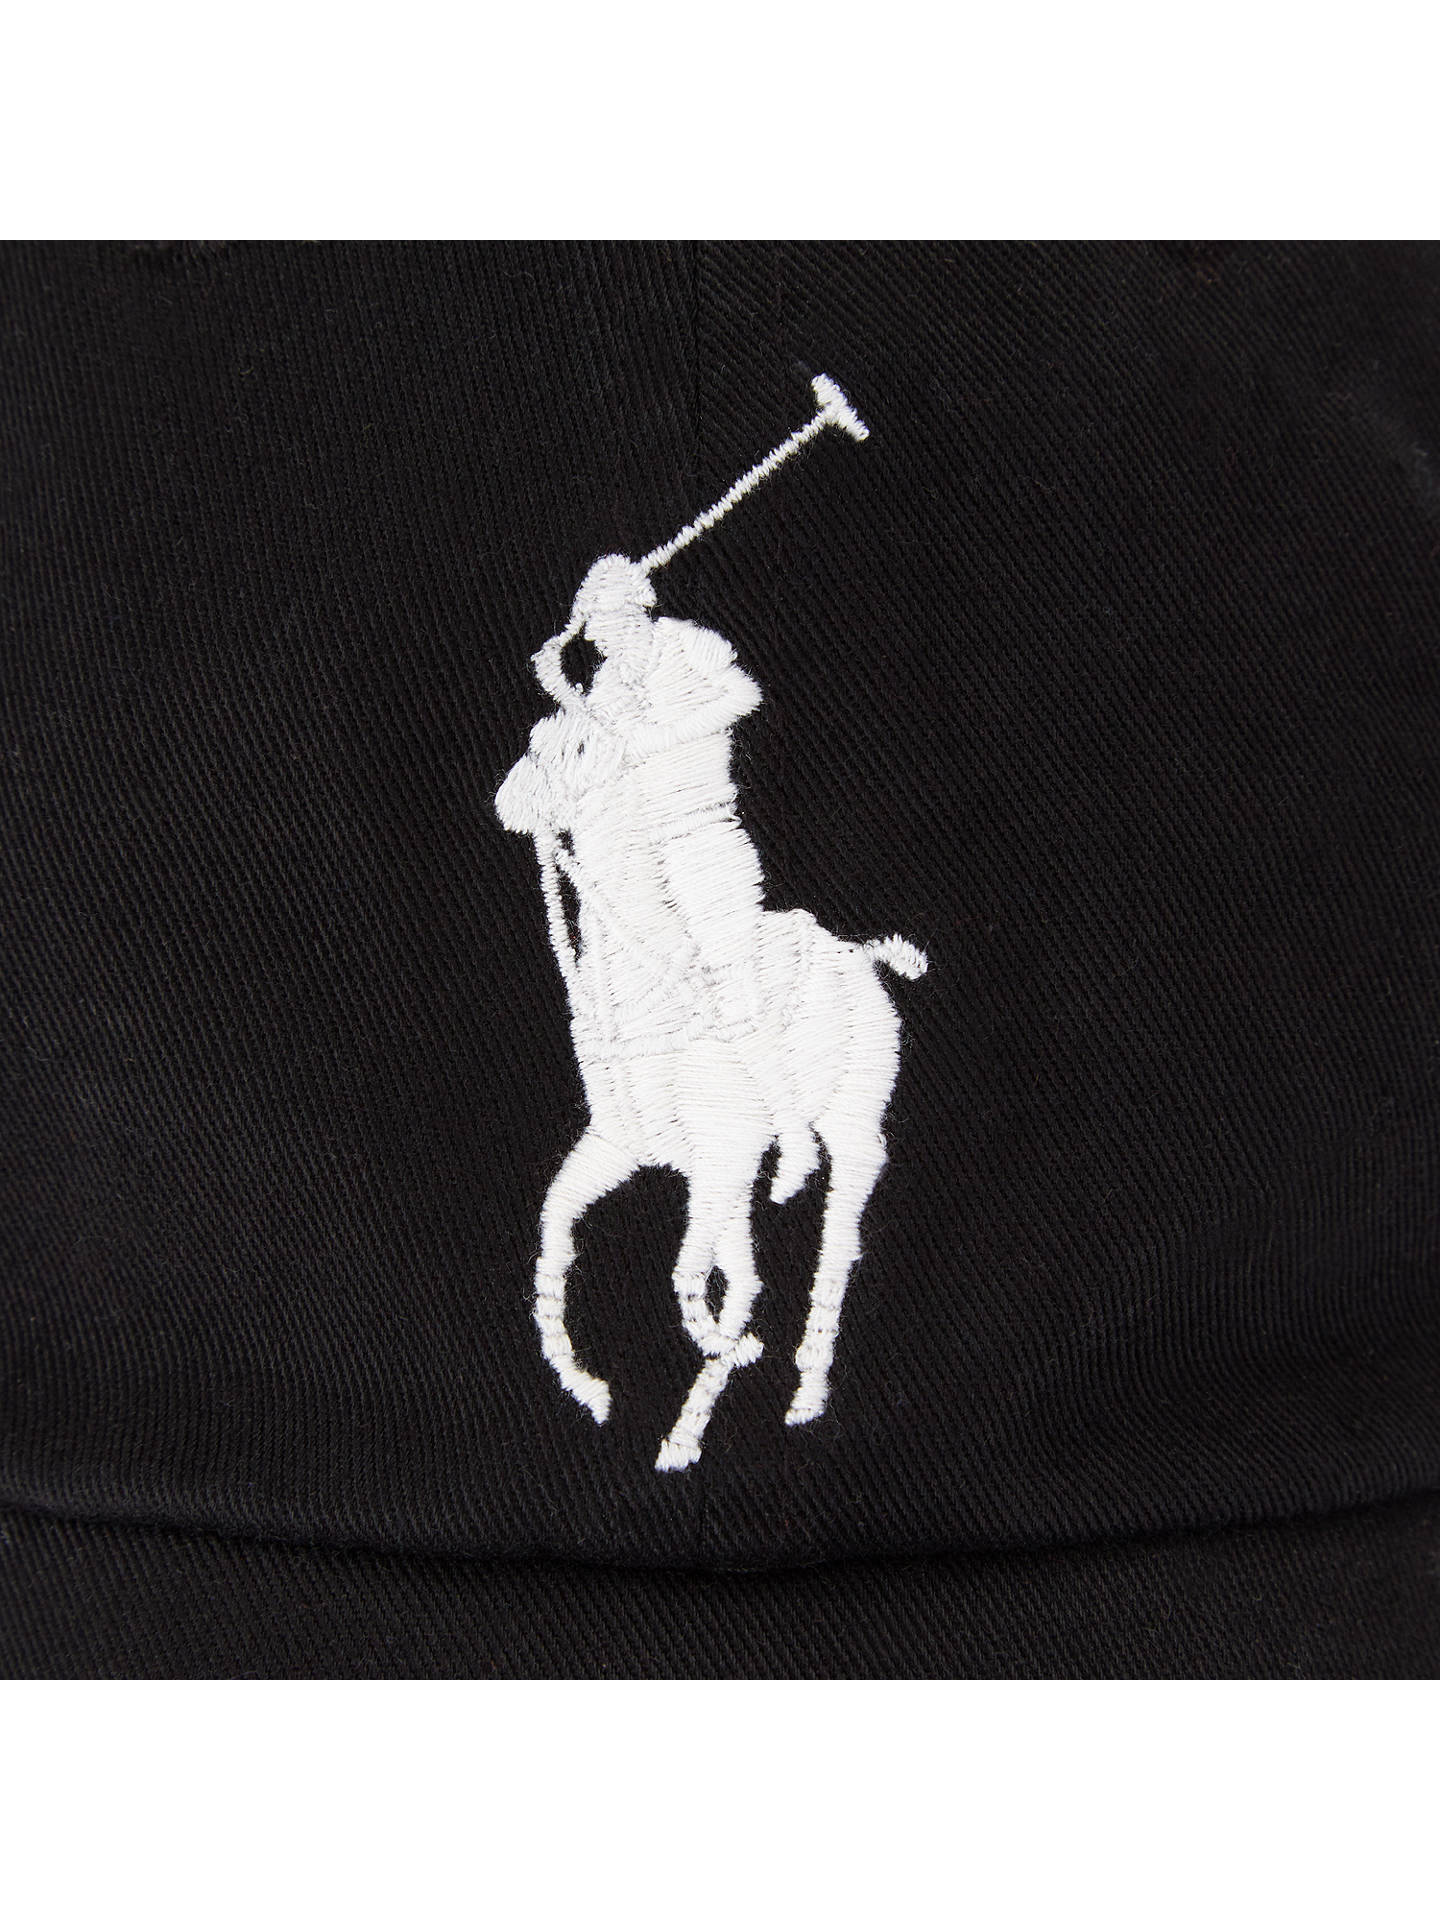 f431e802ee4 ... BuyPolo Ralph Lauren Big Pony Chino Baseball Cap